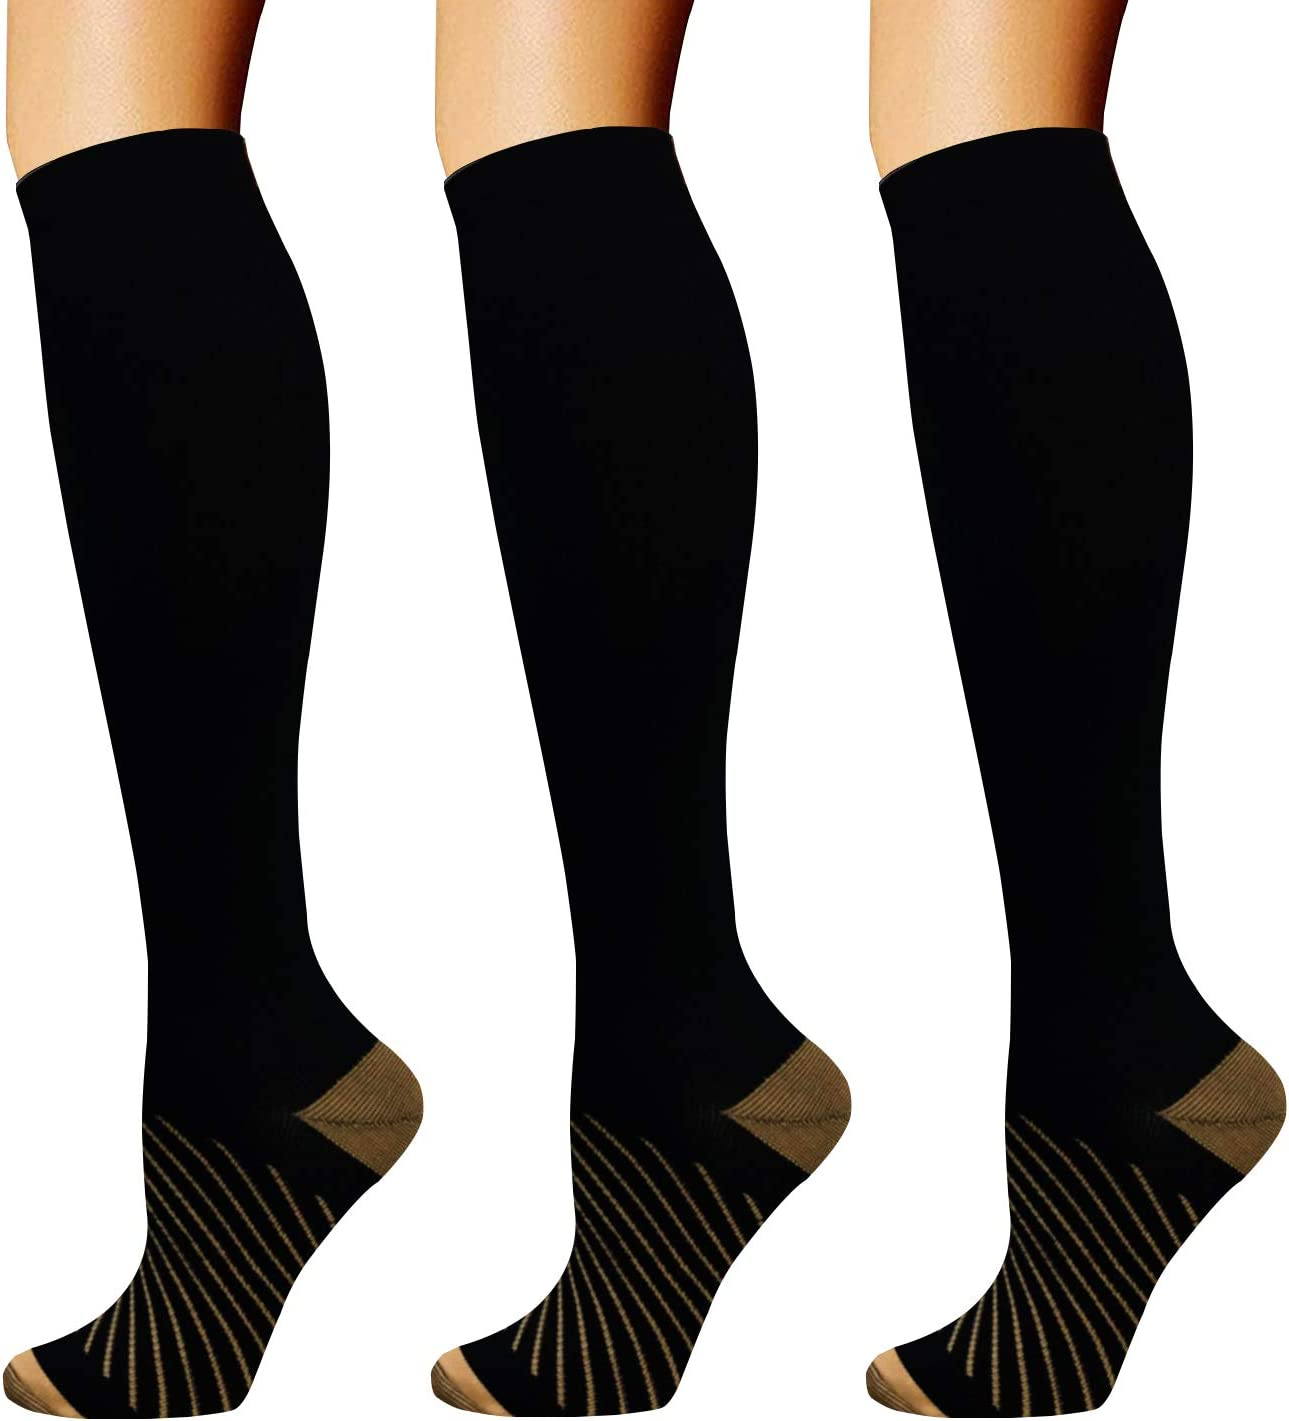 Copper Compression Socks for Men & Women(3 Pairs),20-30mmHg is Best for Running,Medical,Pregnancy,Travel,Nurses